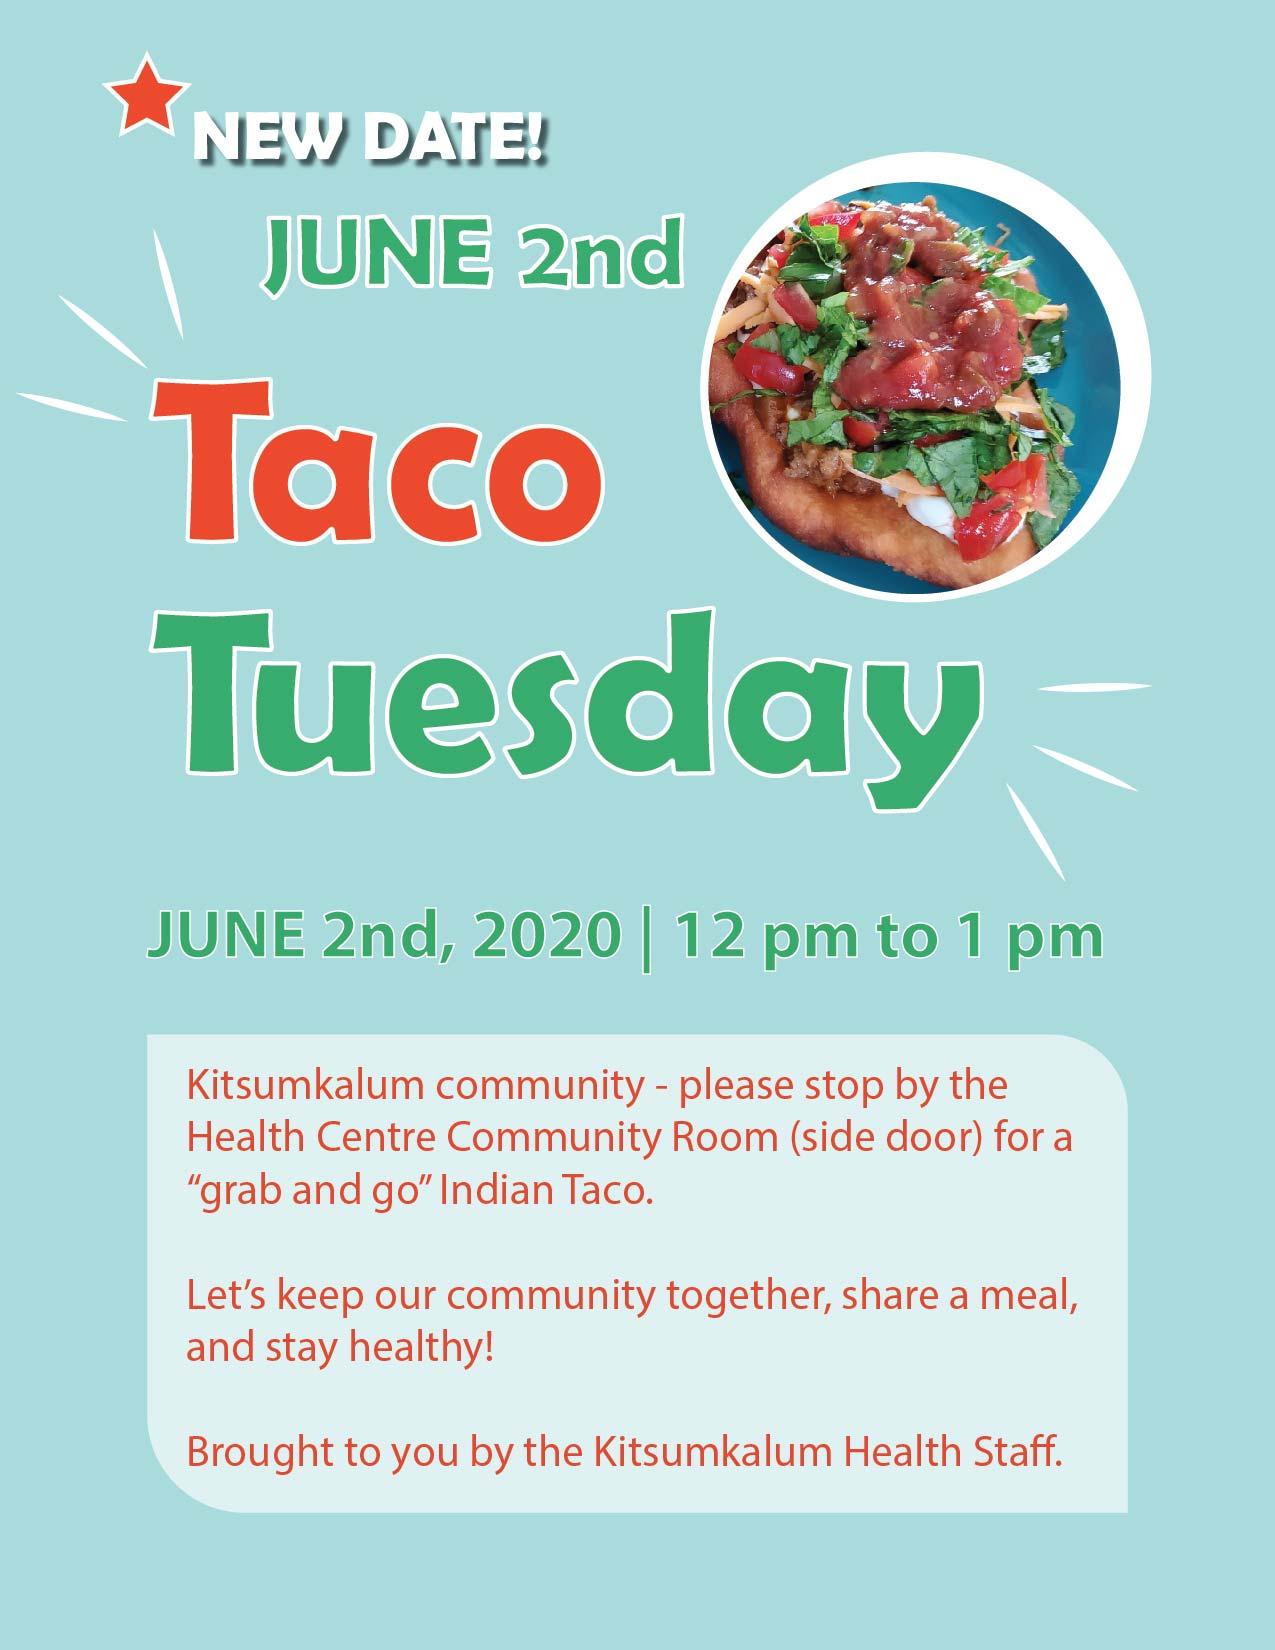 Taco Tuesday – Kitsumkalum Community Lunch NEW DATE June 2nd